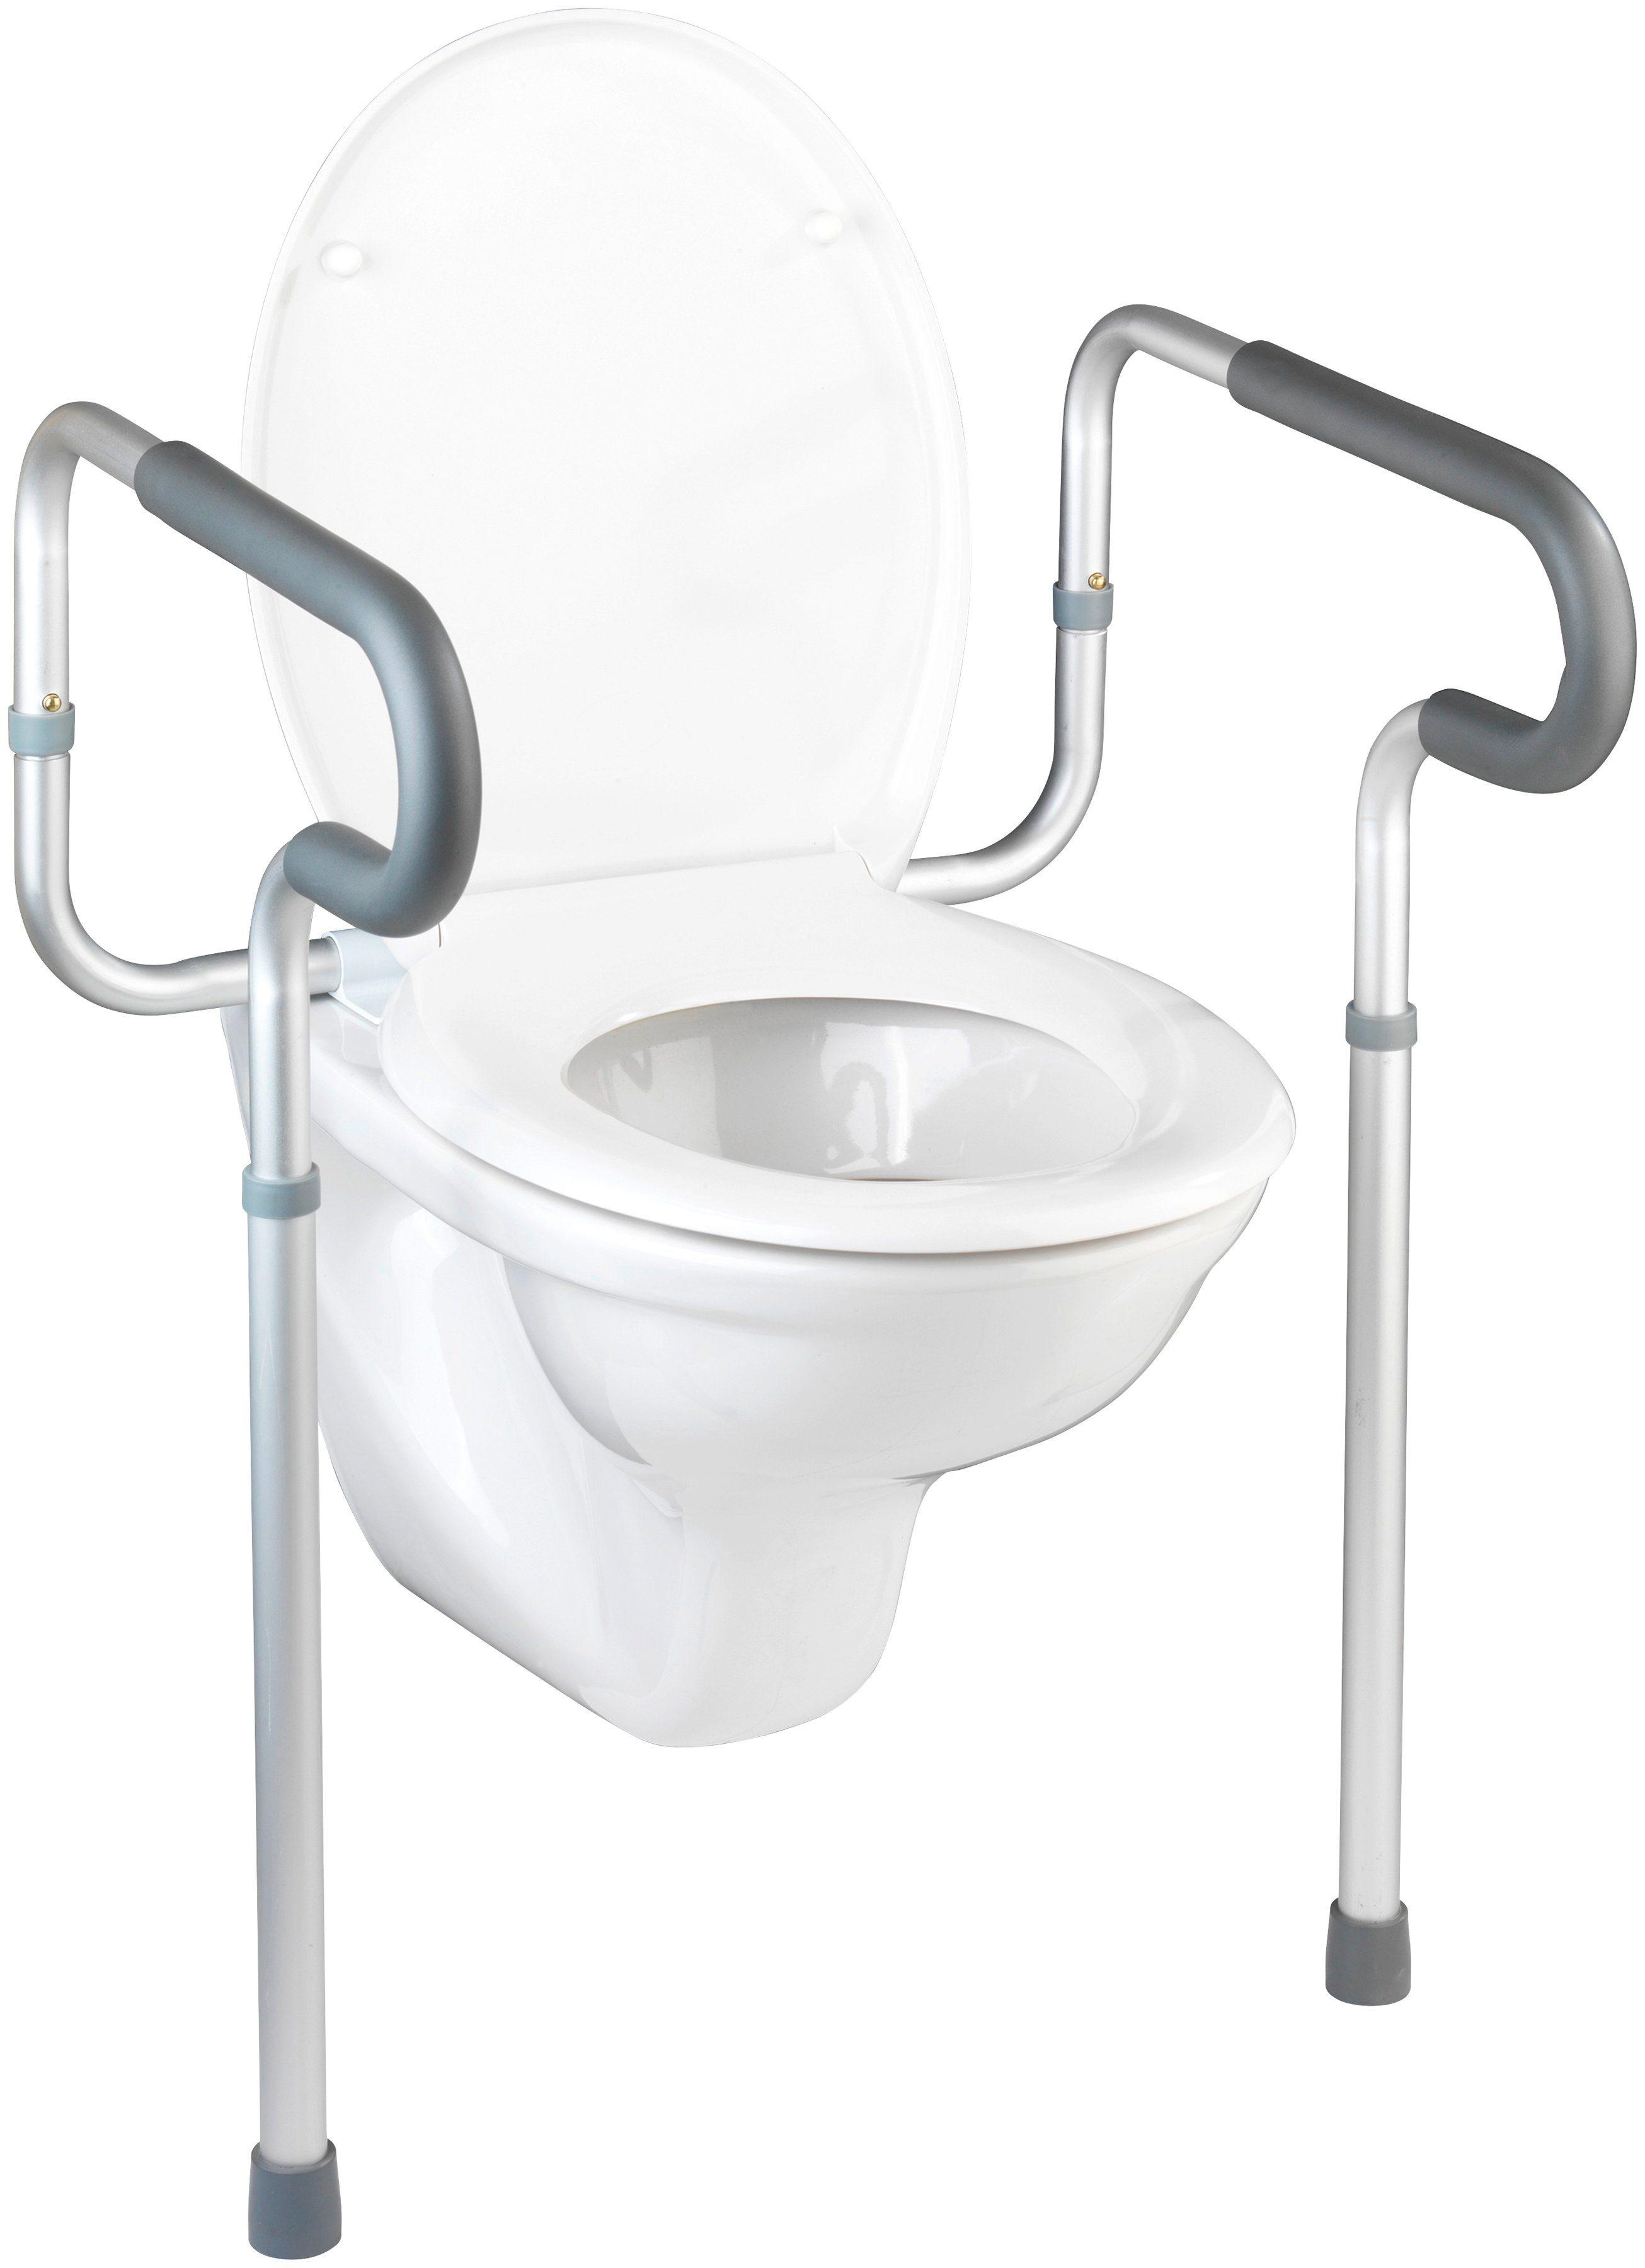 Haltegriff »Secura WC-Stützhilfe«